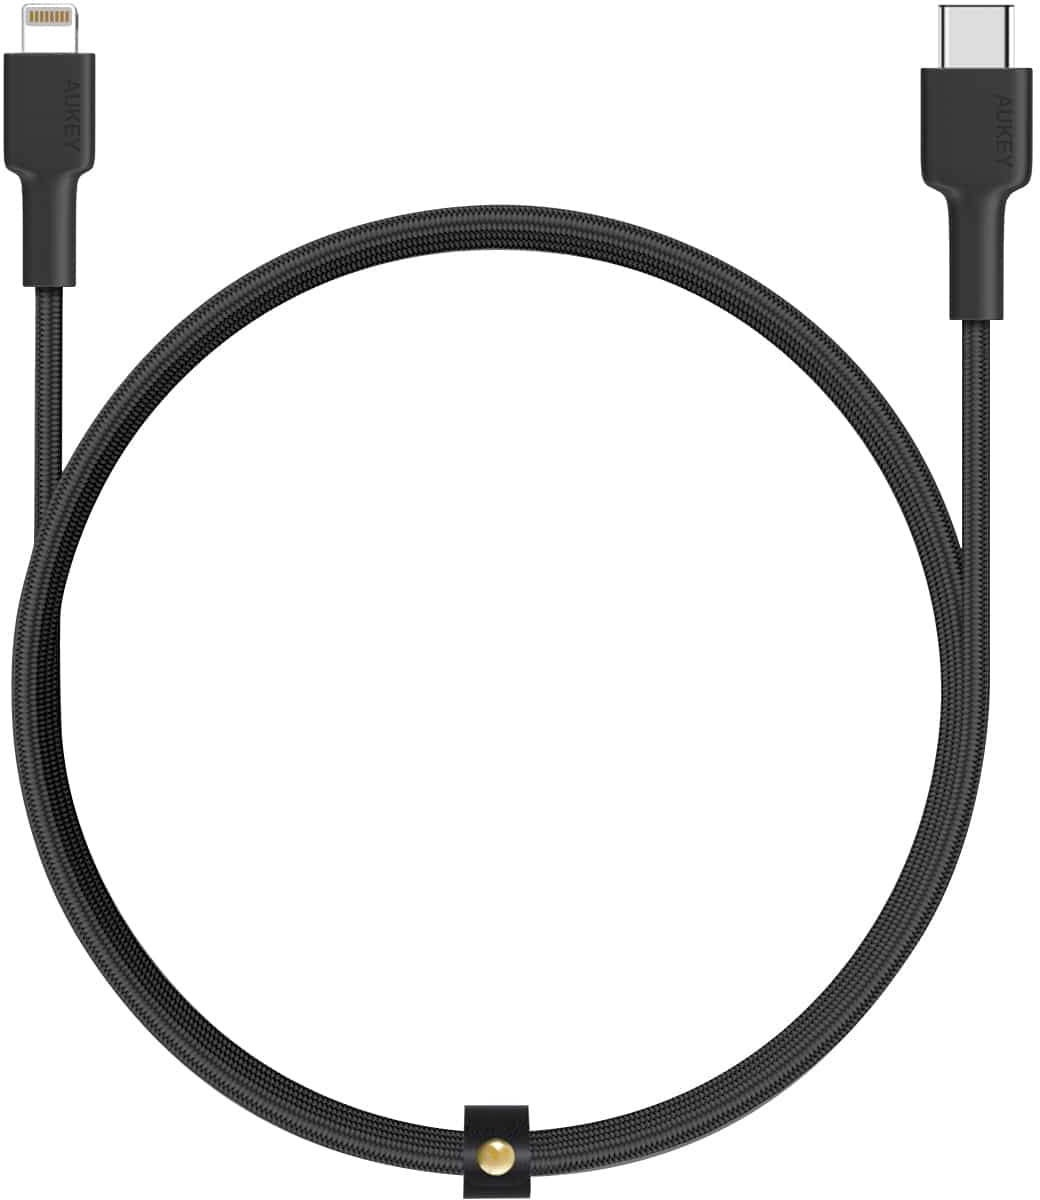 Кабель AUKEY Braided Nylon MFi USB-C to Lightning Cable, 2m, черный